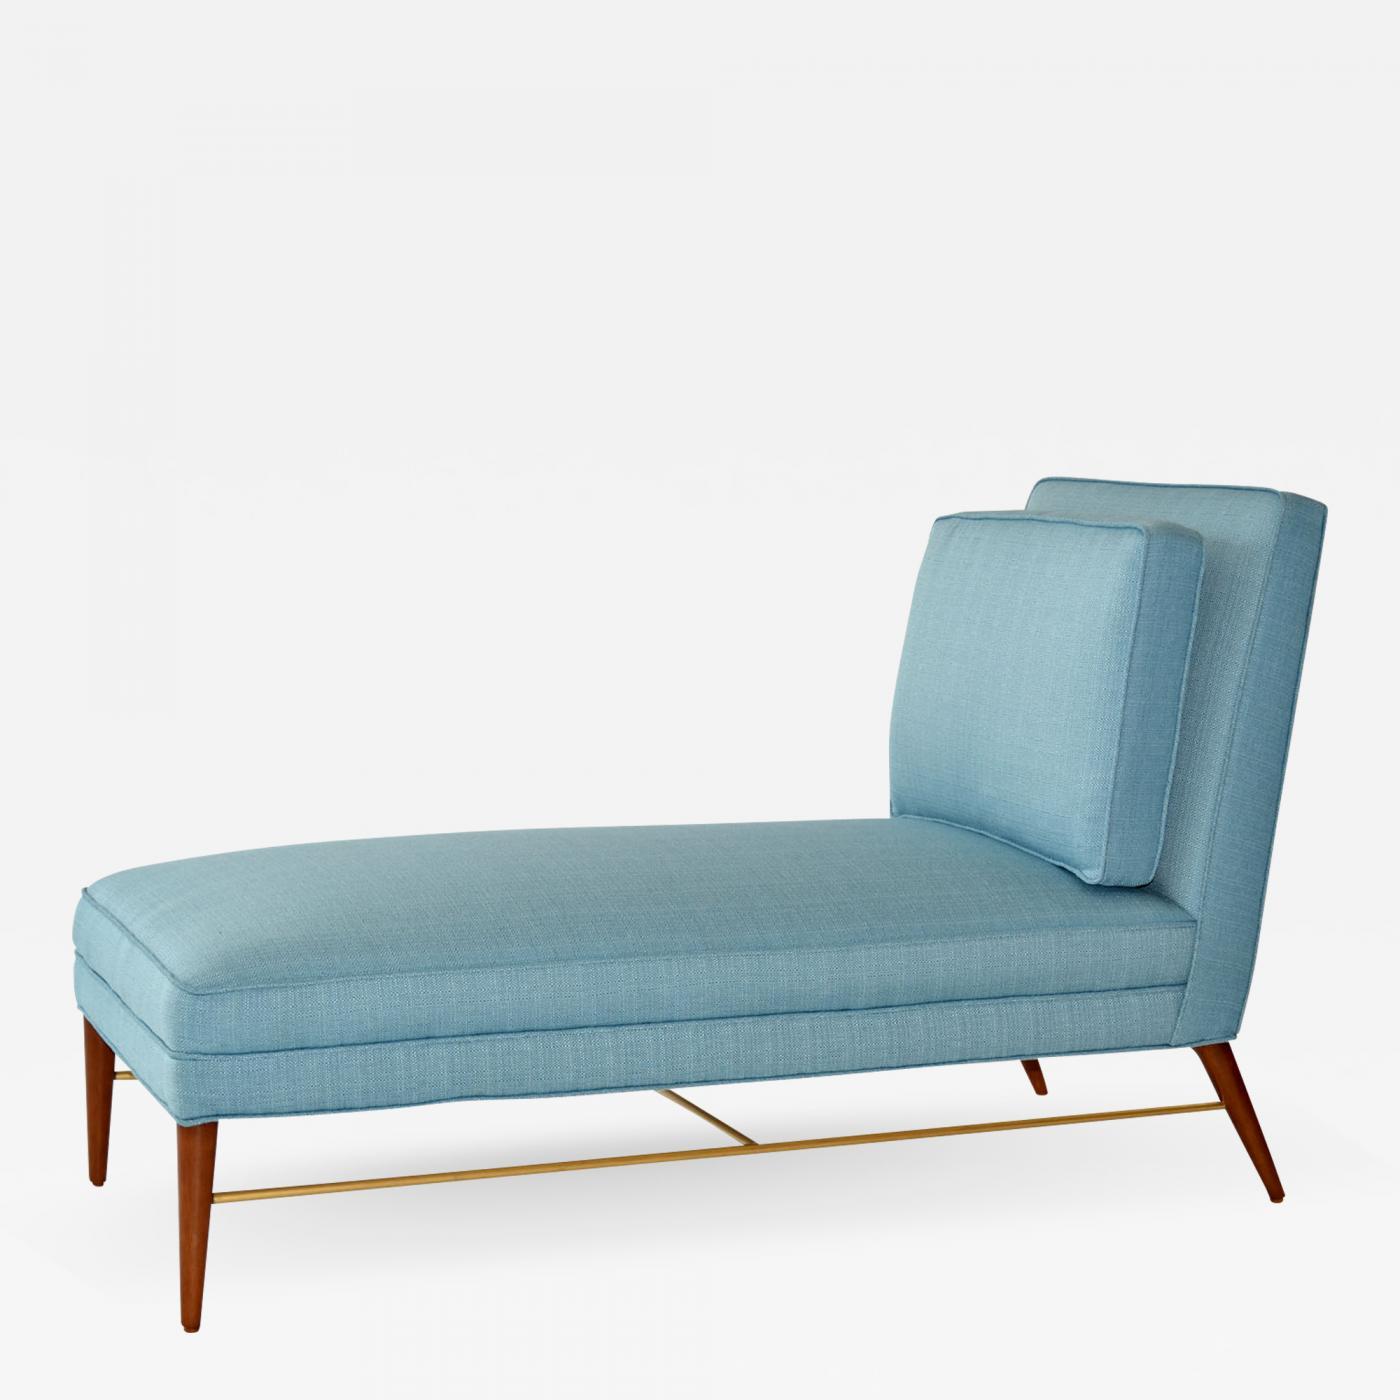 Details About Modern Chaise Lounge Bed Chair Recliner Single Sleeper Light Grey Fabric Alsten